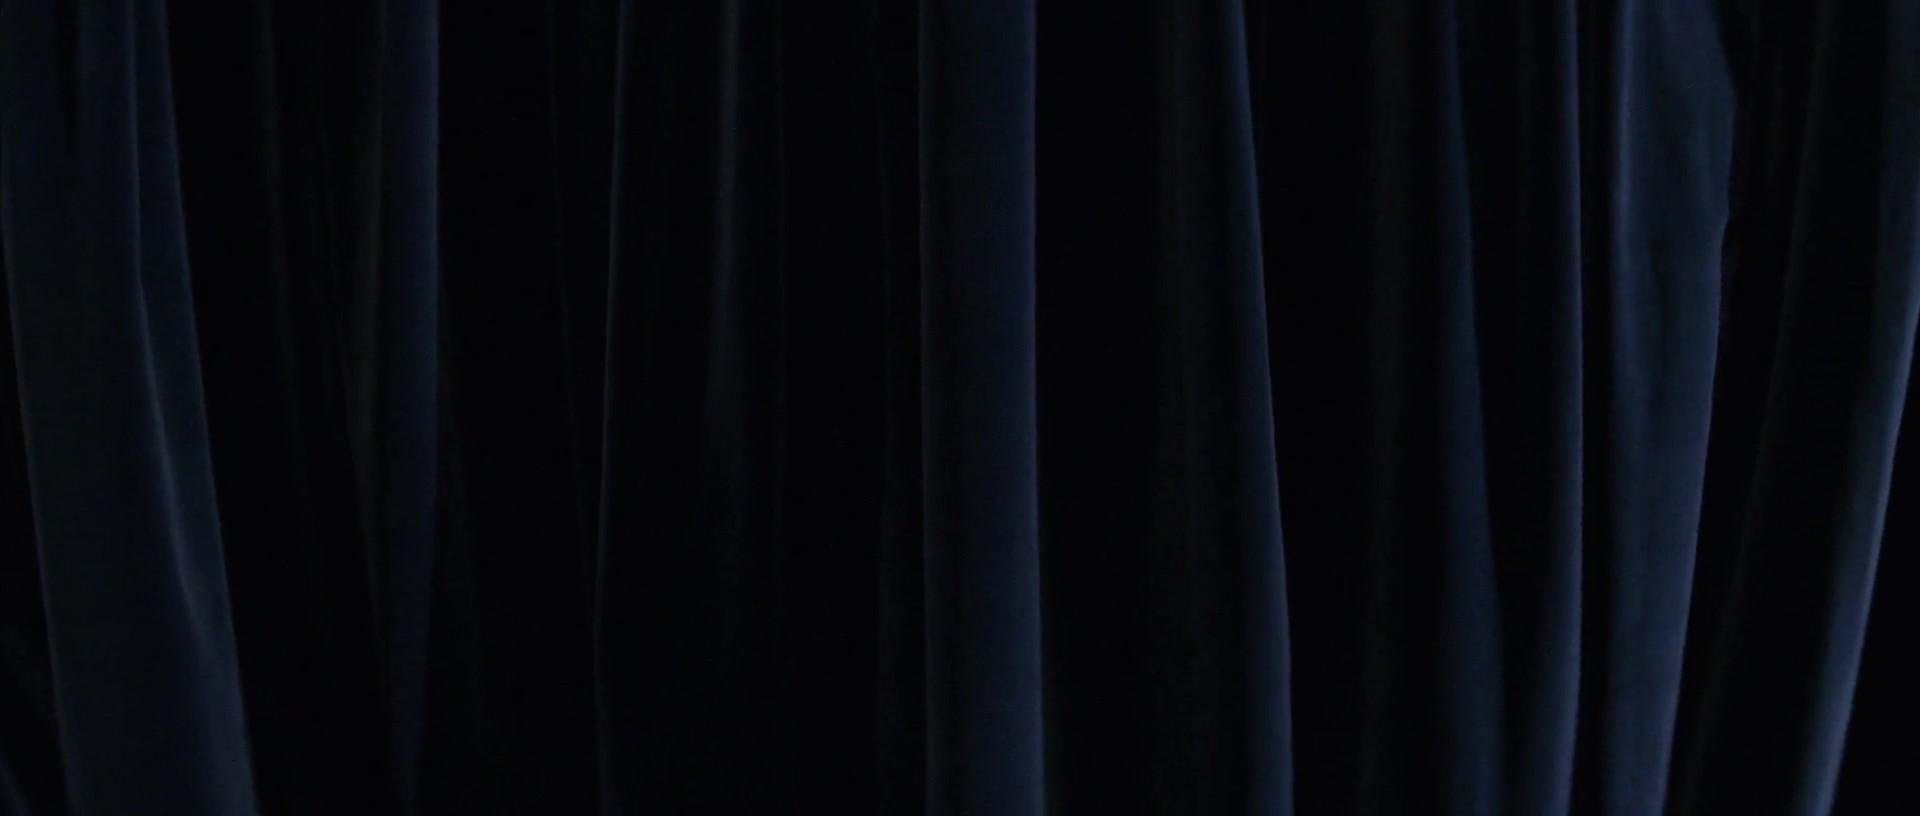 Academia Rushmore (1998) BDrip Dual x IndioLoko66(CineClubClasico)_Moment18.jpg